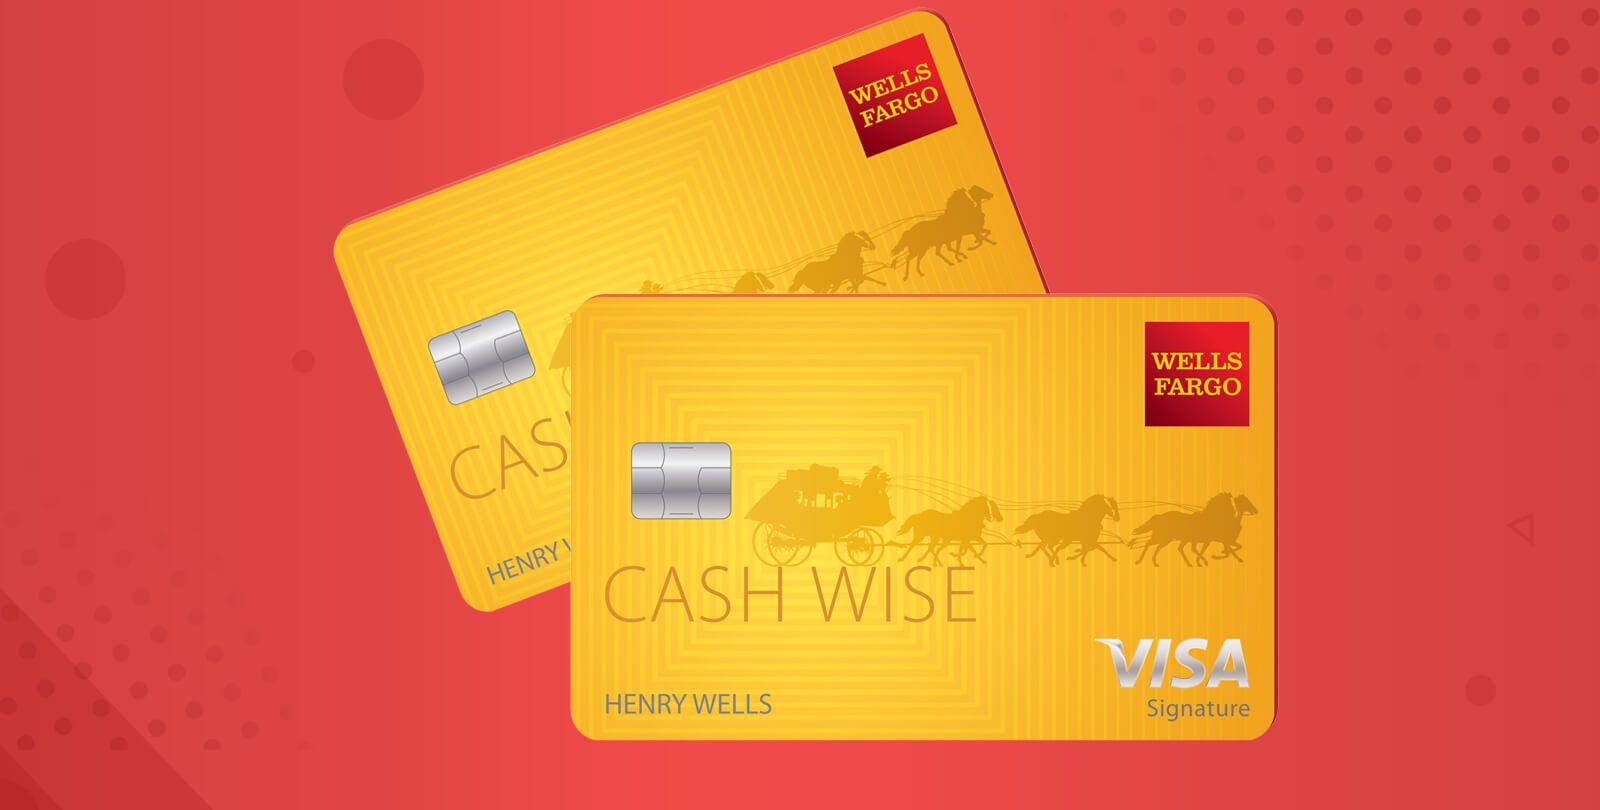 Take The Benefit Of Sign Up Bonus And Choose Credit Card